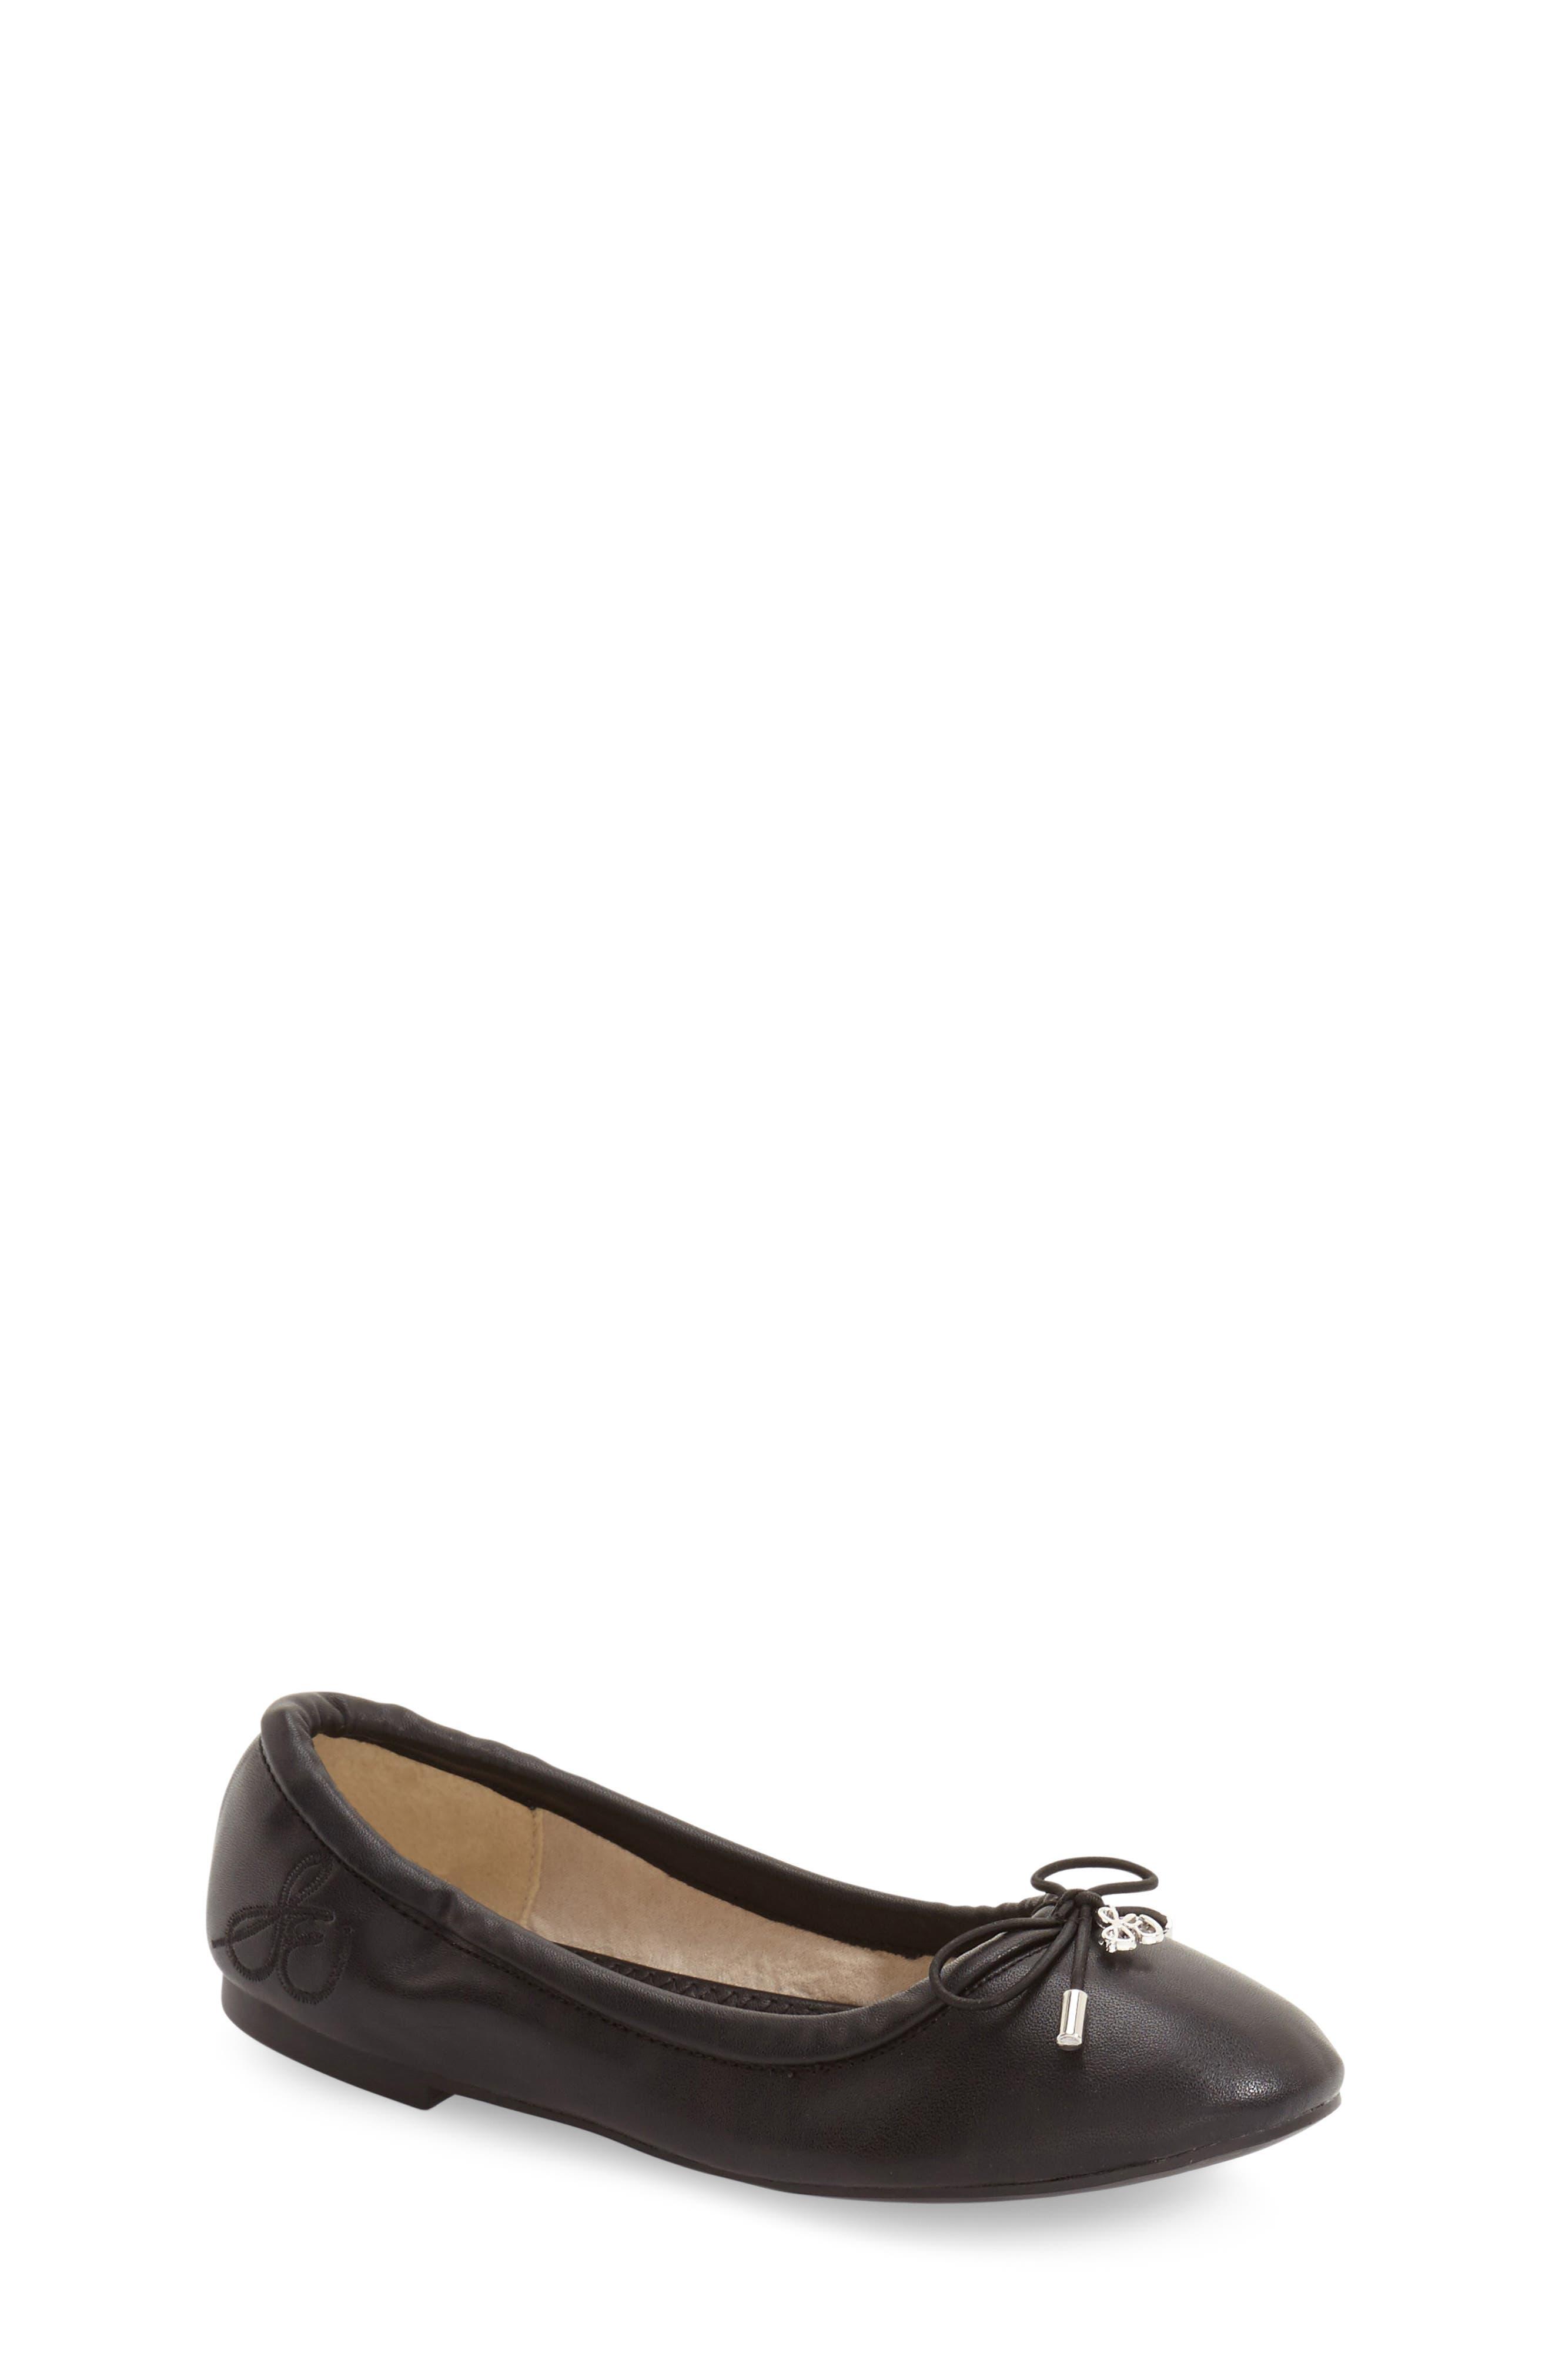 Girls Sam Edelman Felicia Ballet Flat Size 3 M  Black